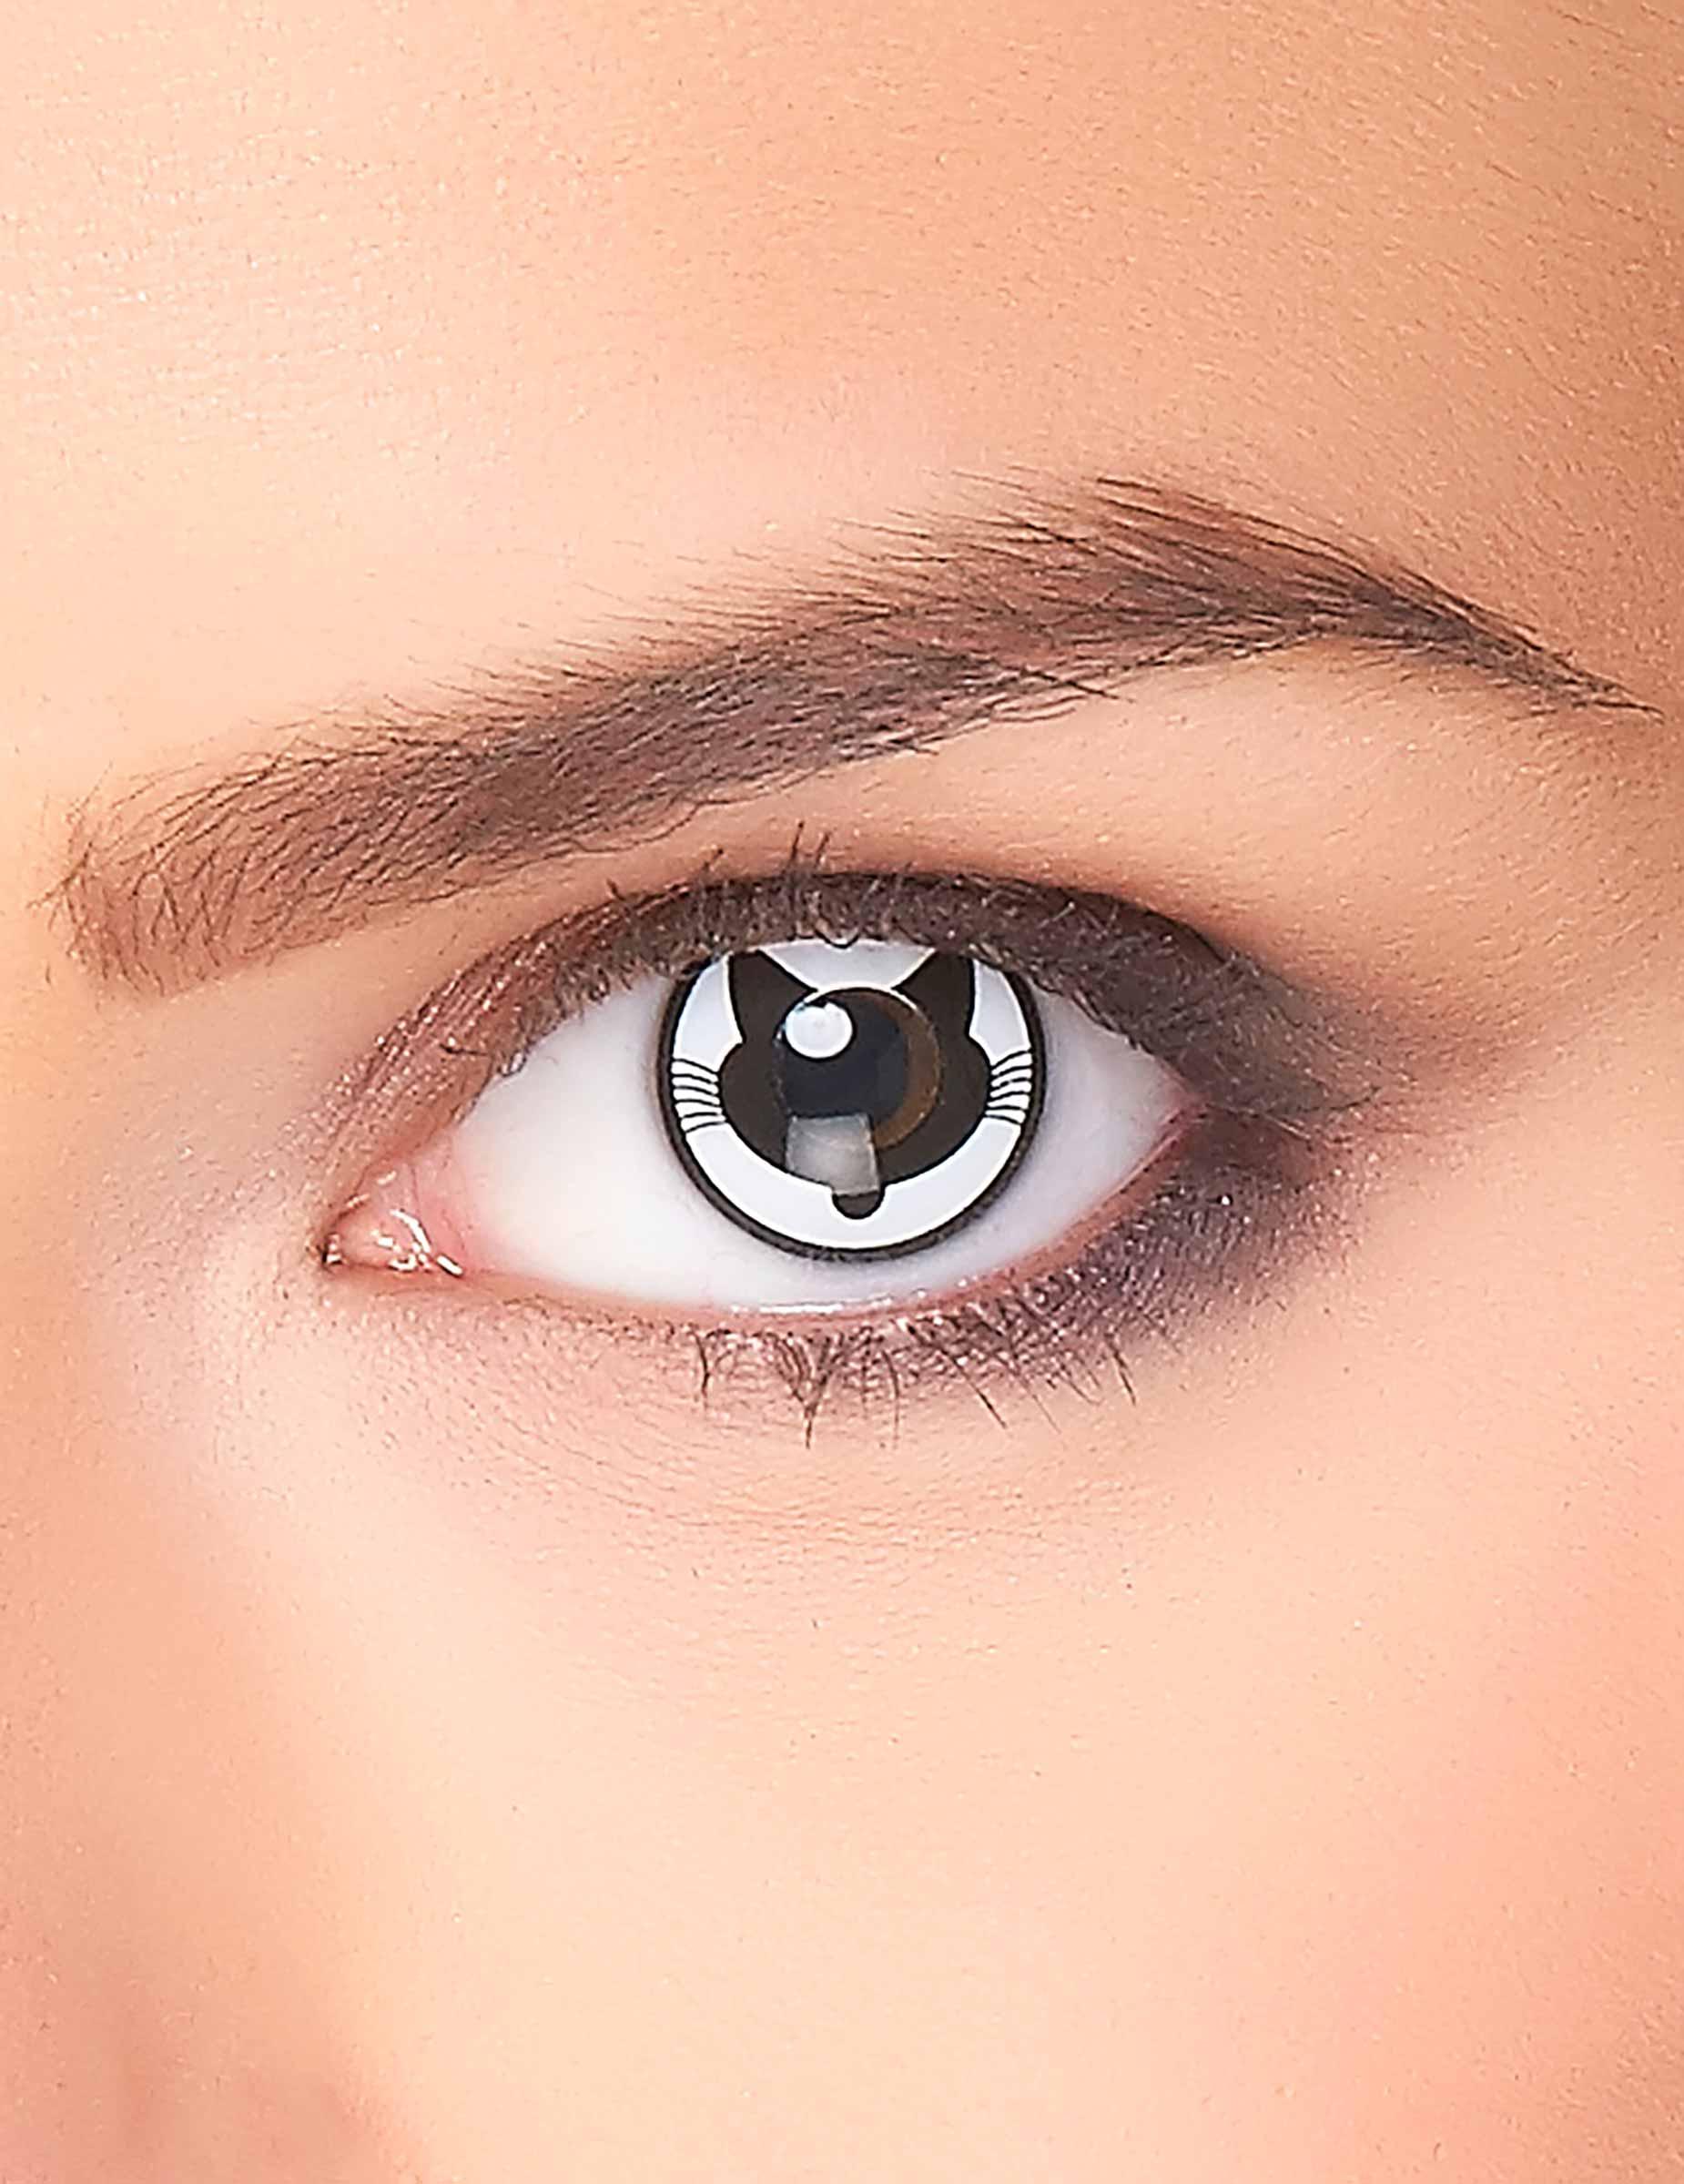 accessoires kontaktlinsen verr ckte katze f r erwachsene schminke und g nstige faschingskost me. Black Bedroom Furniture Sets. Home Design Ideas